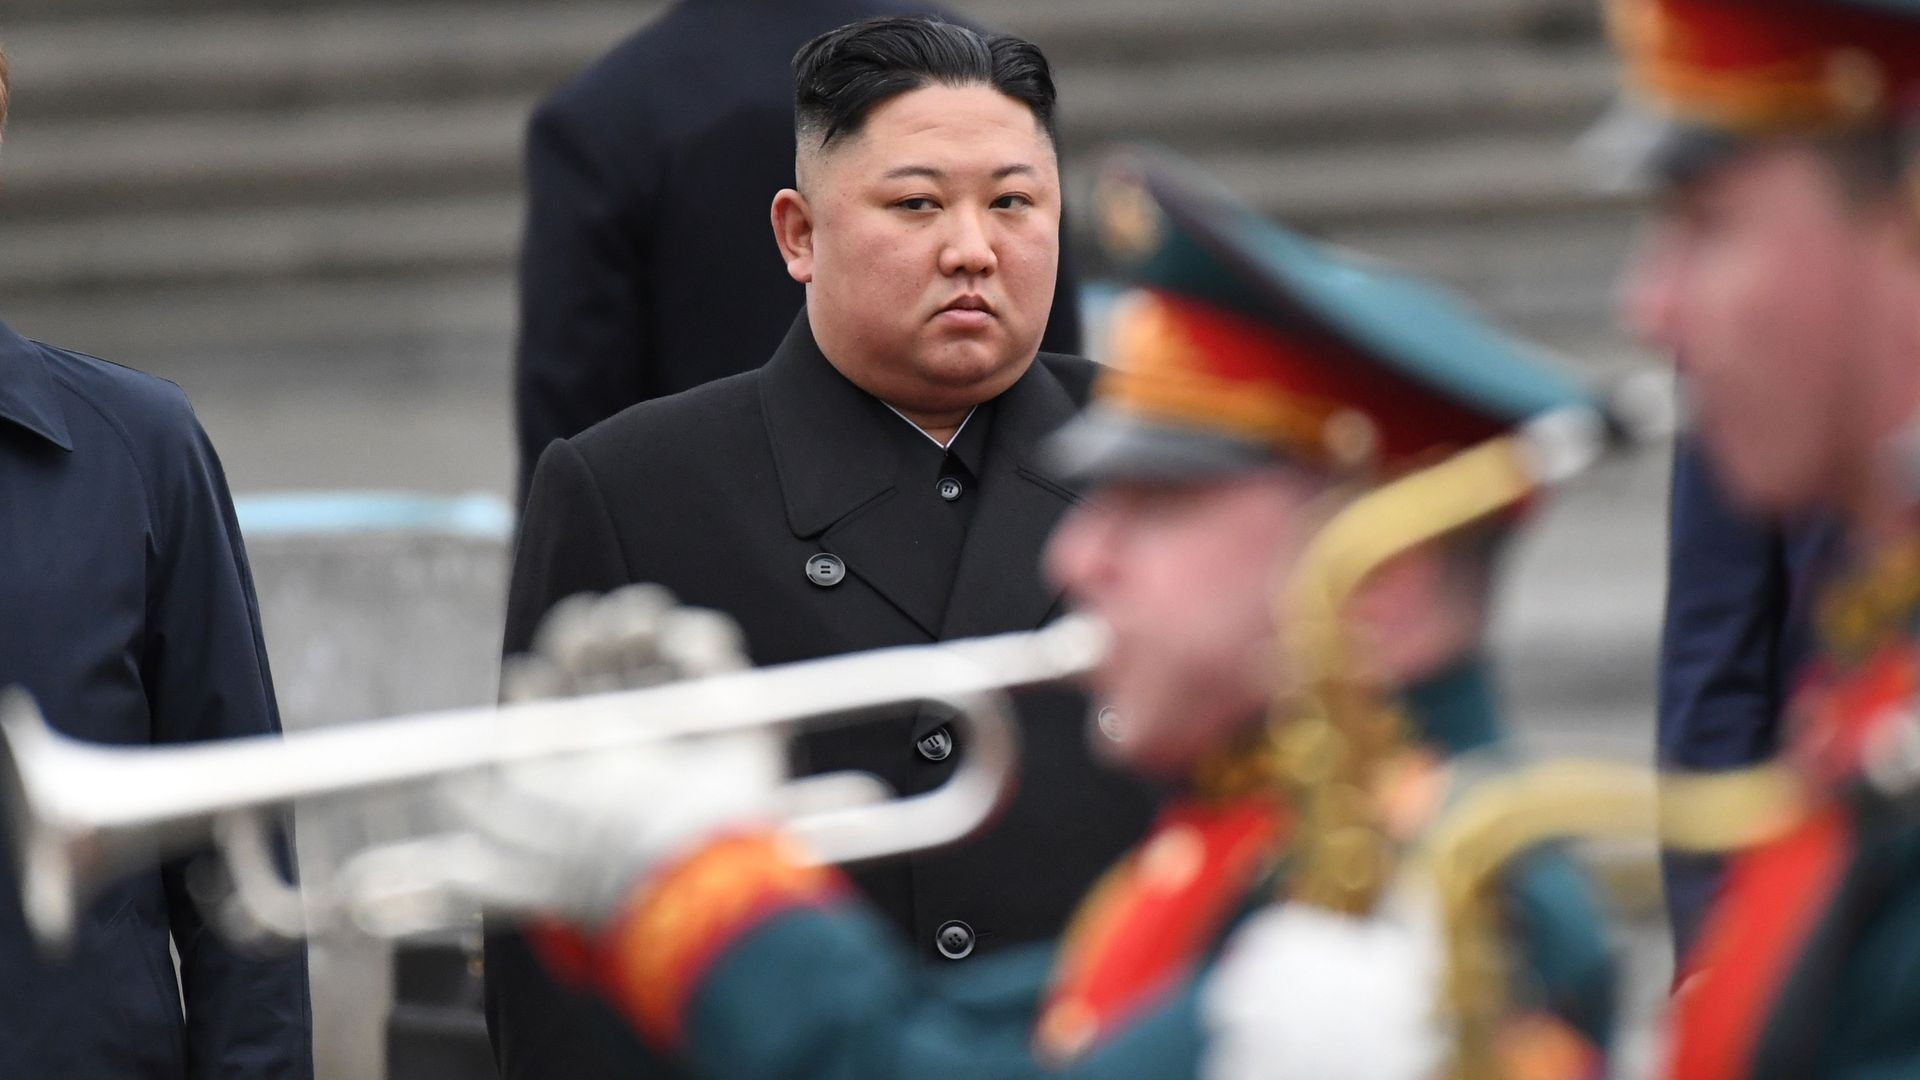 Kim Jong-un in Russia for summit with Vladimir Putin